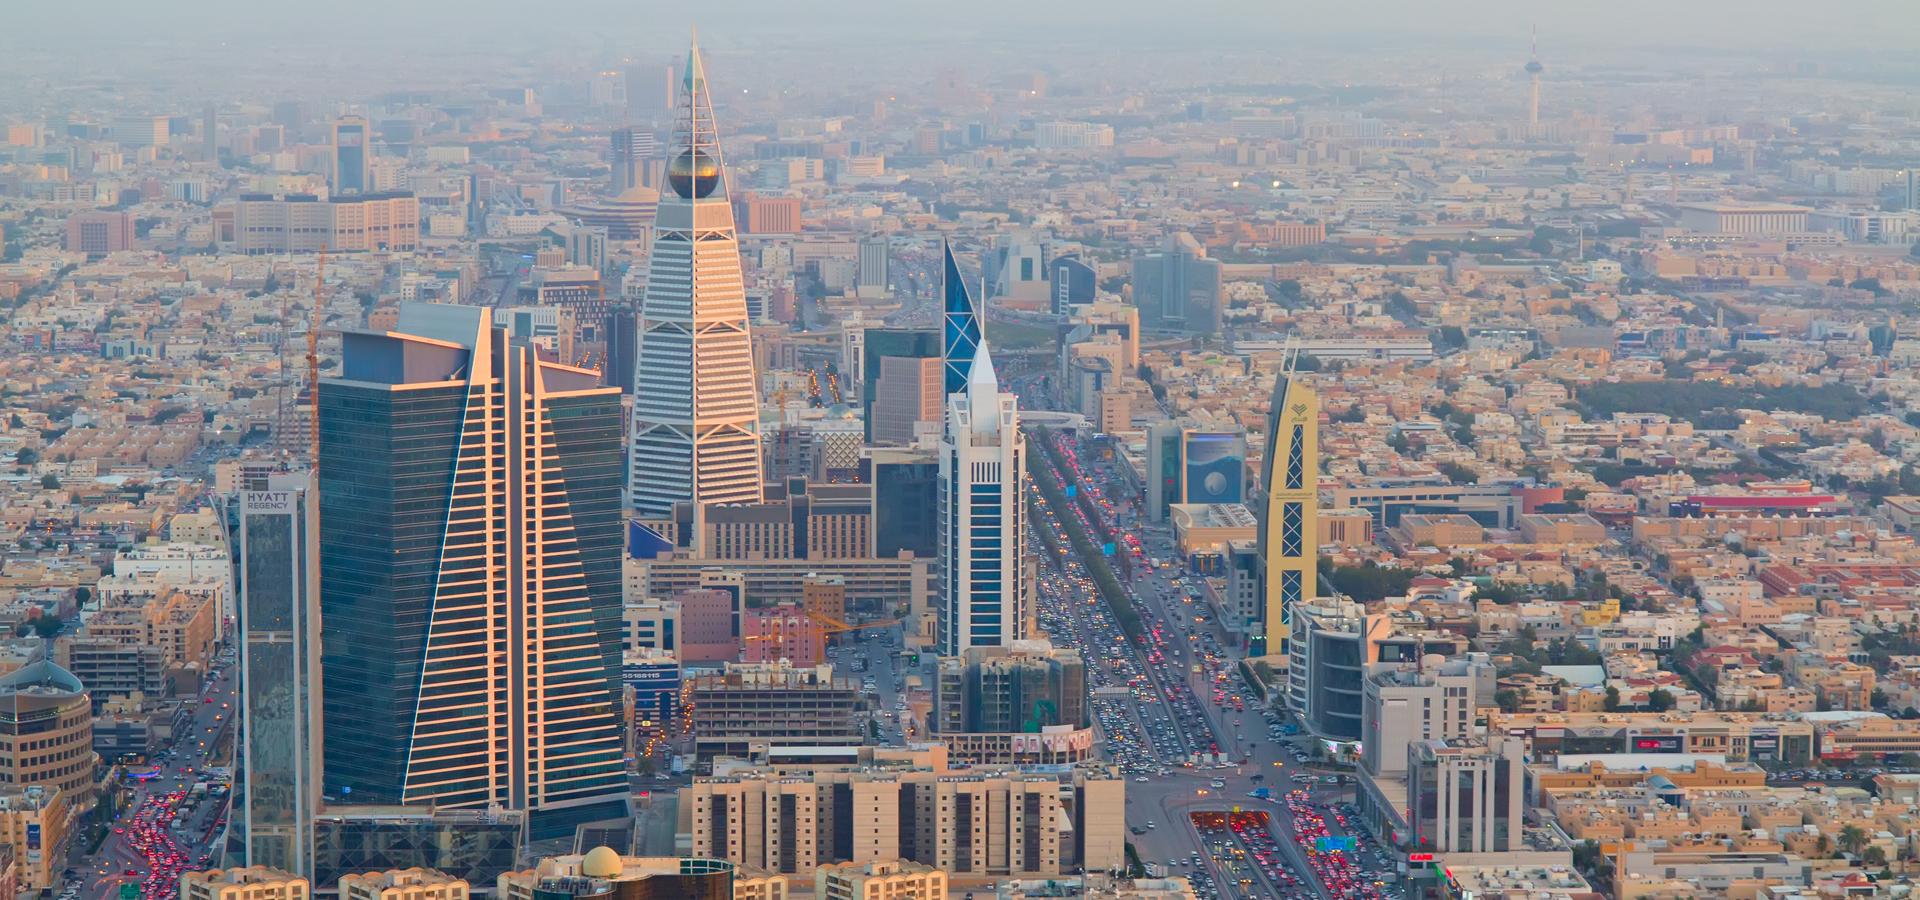 Peer-to-peer advisory in Makkah, Mecca Region, Saudi Arabia